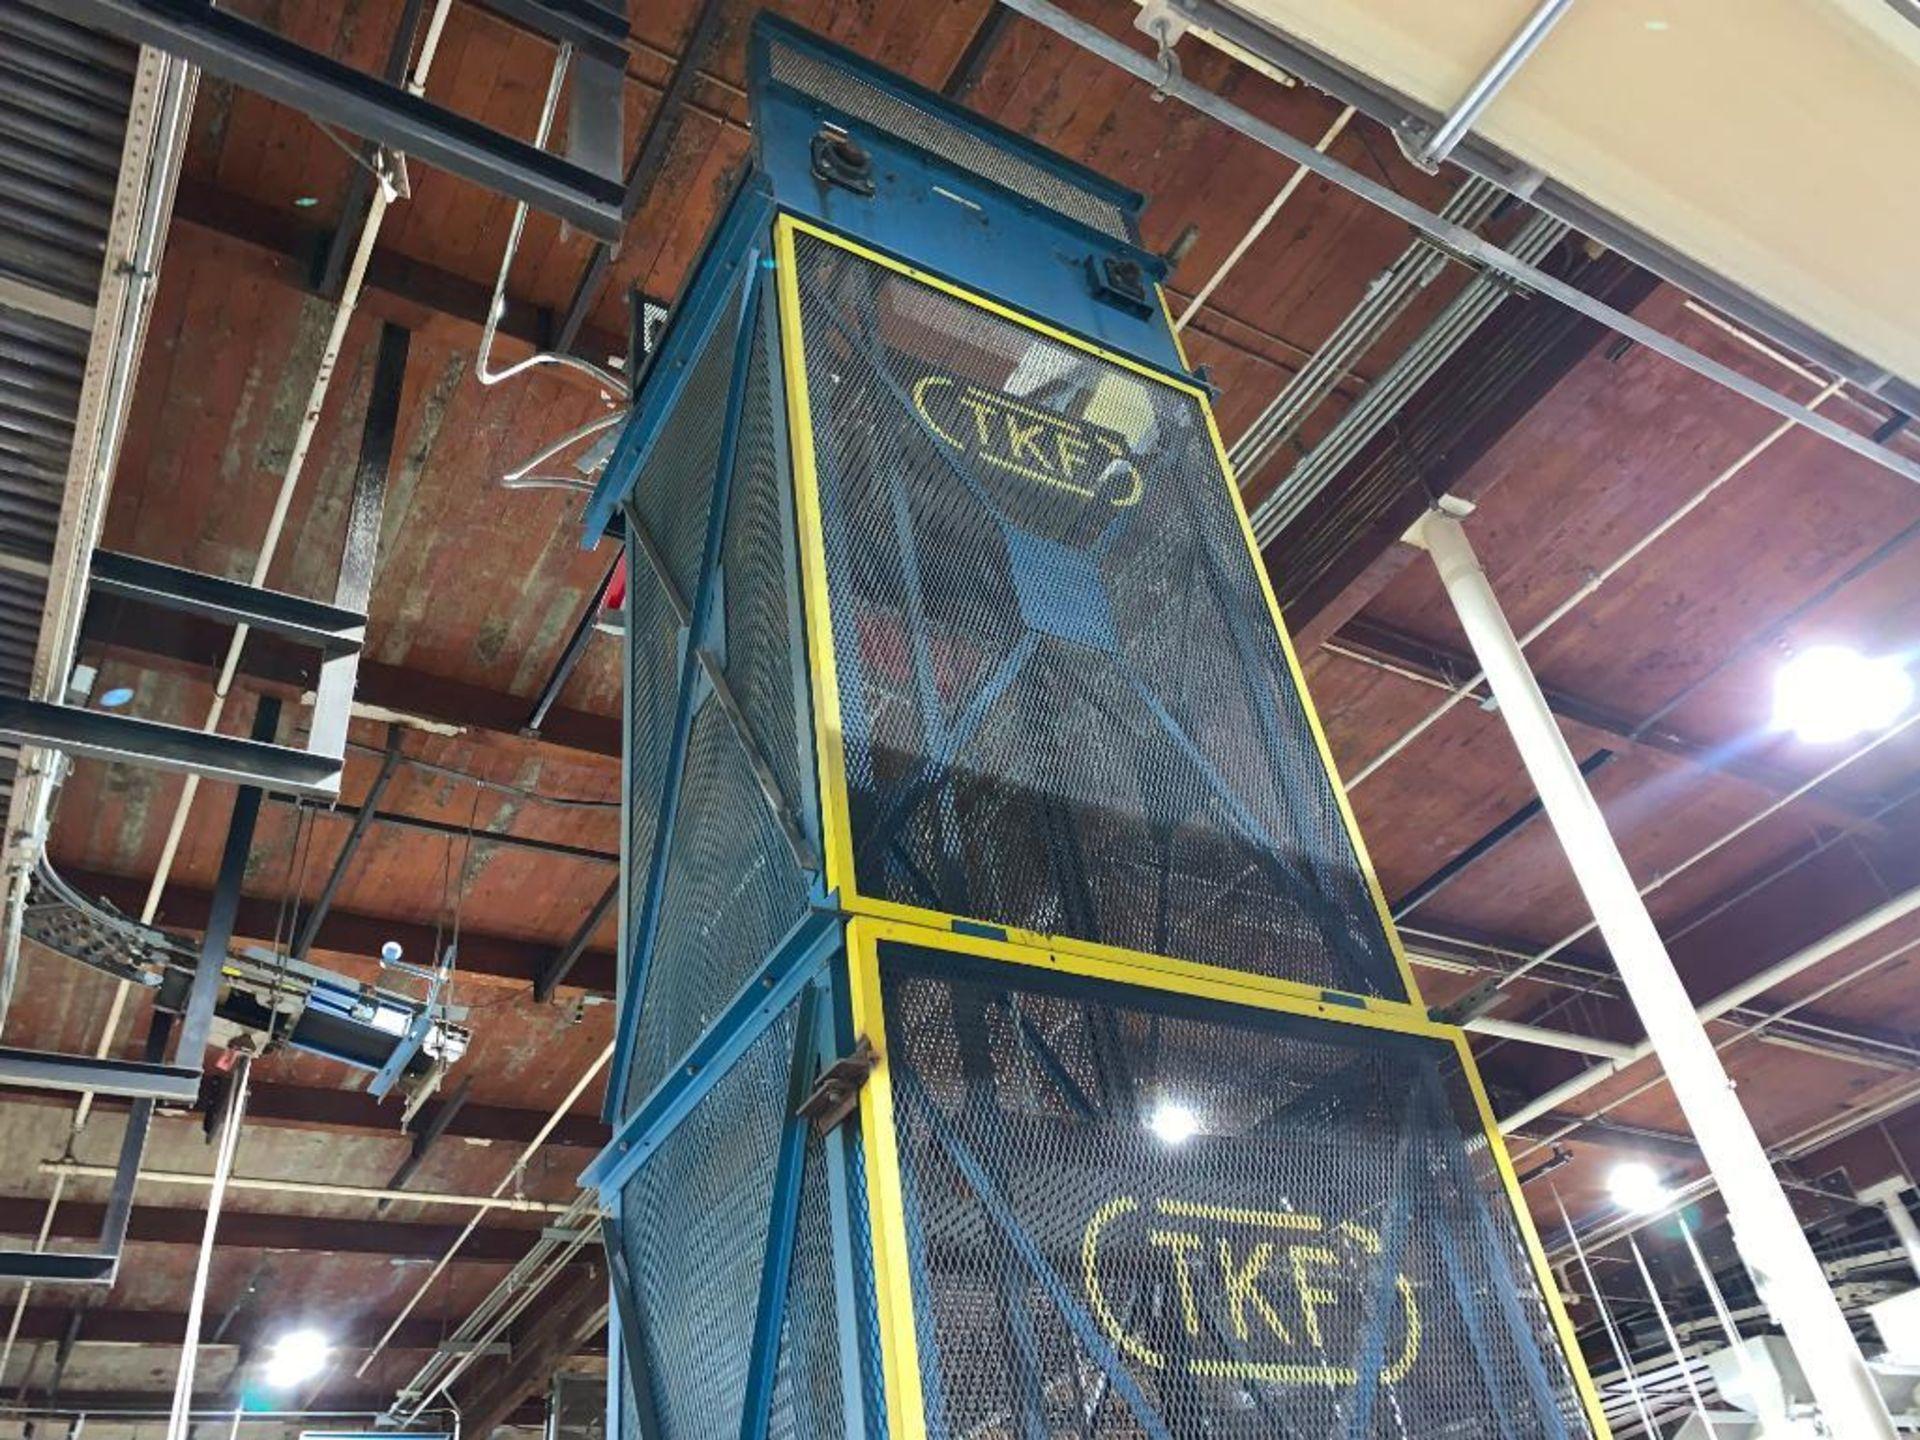 TKF vertical case elevator parts - Image 13 of 13